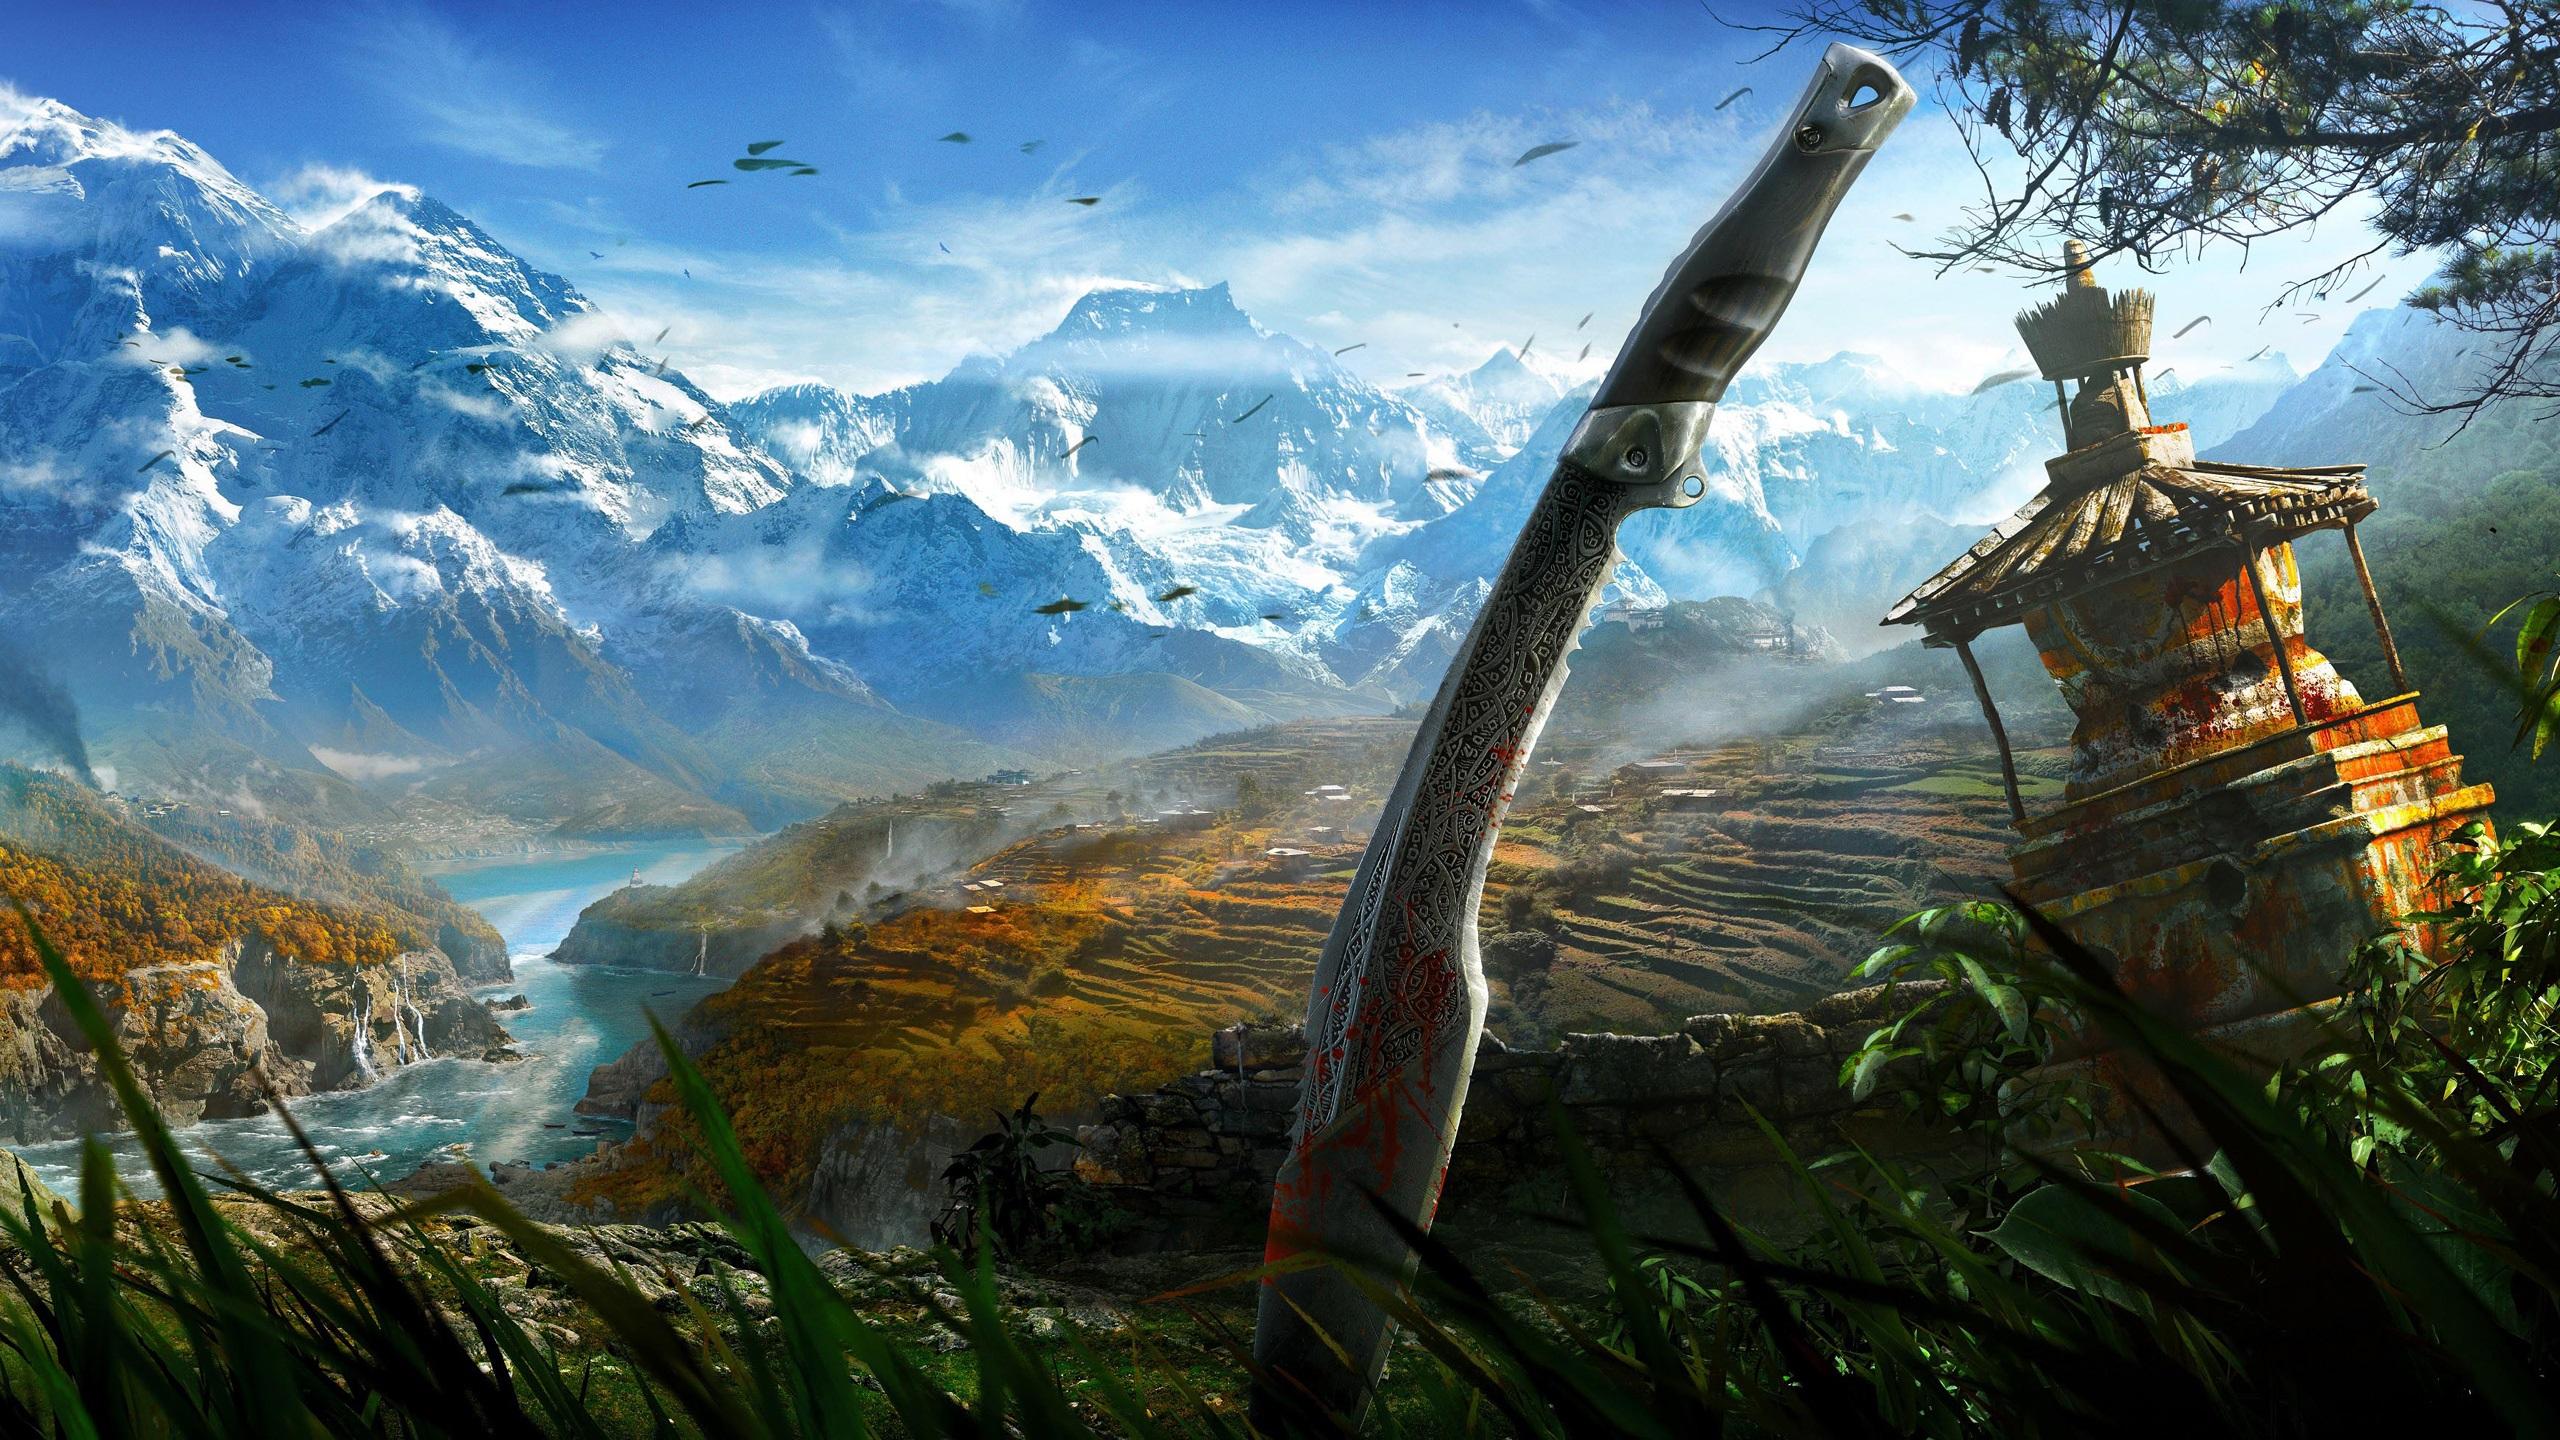 Wallpaper Far Cry 4 Hd 2560x1440 Qhd Picture Image